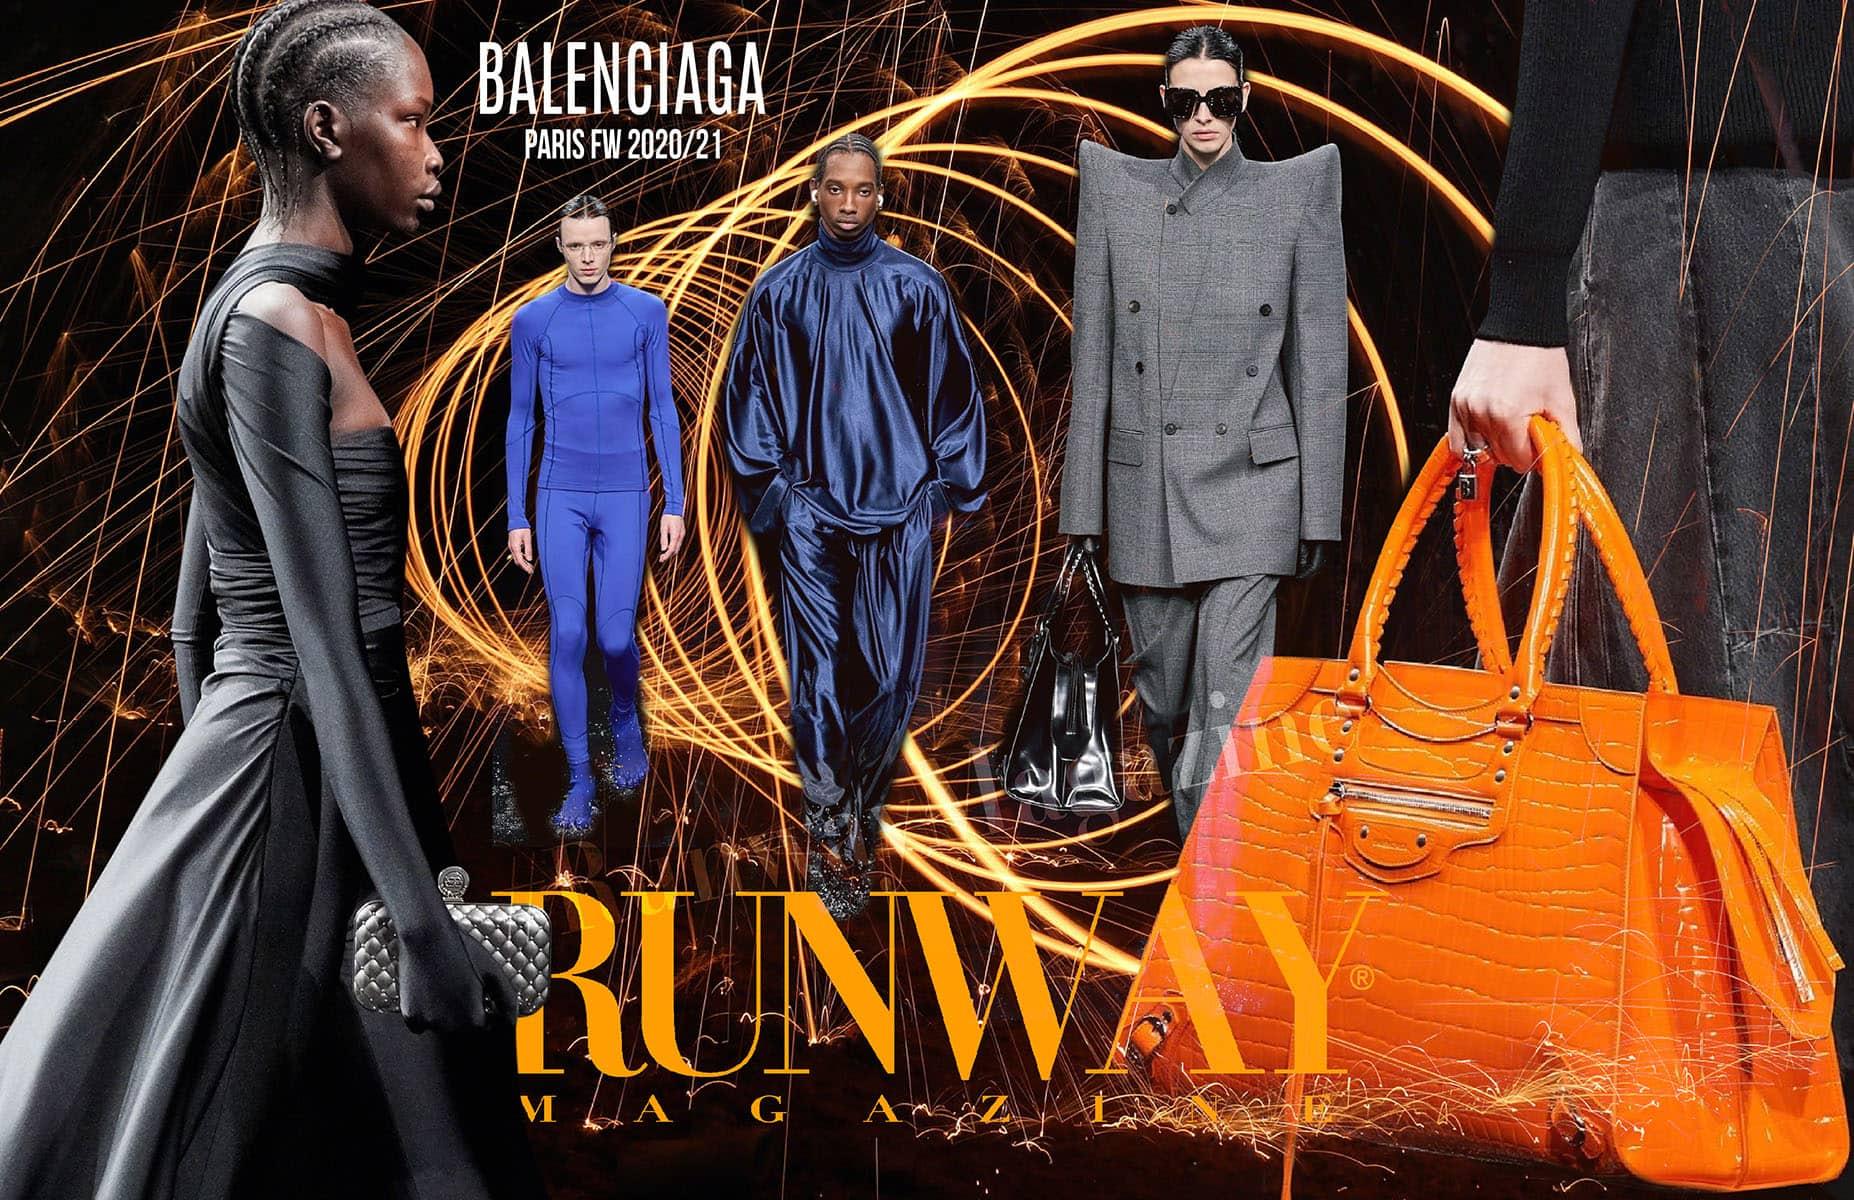 BALENCIAGA Fall-Winter 2020-2021 Paris by RUNWAY MAGAZINE